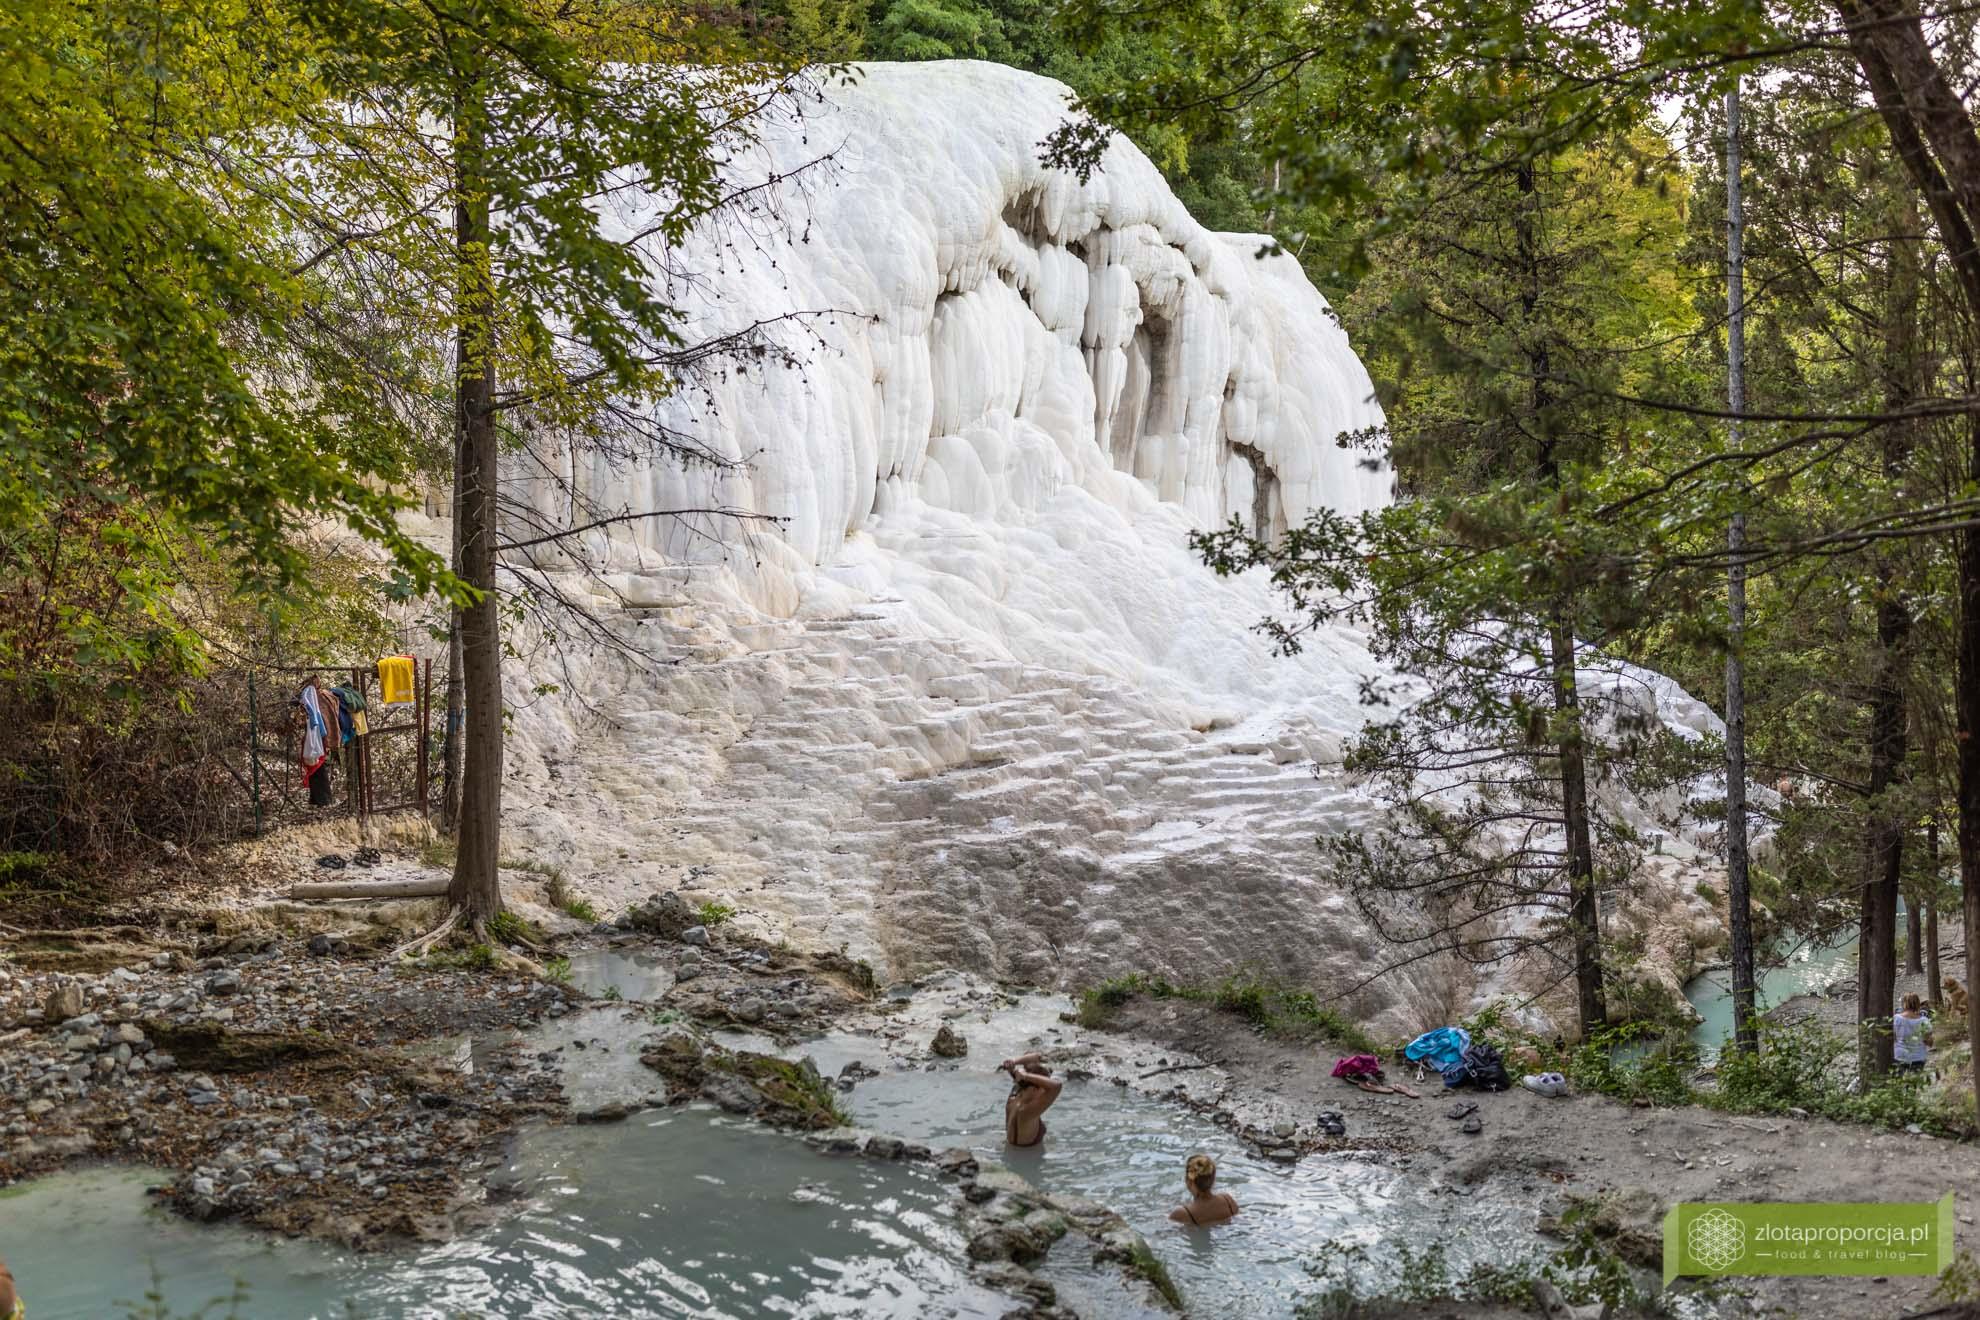 Toskania; atrakcje Toskanii; Toskania gorące źródła, termy Toskania; Bagni San Filippo; Terme San Filippo;